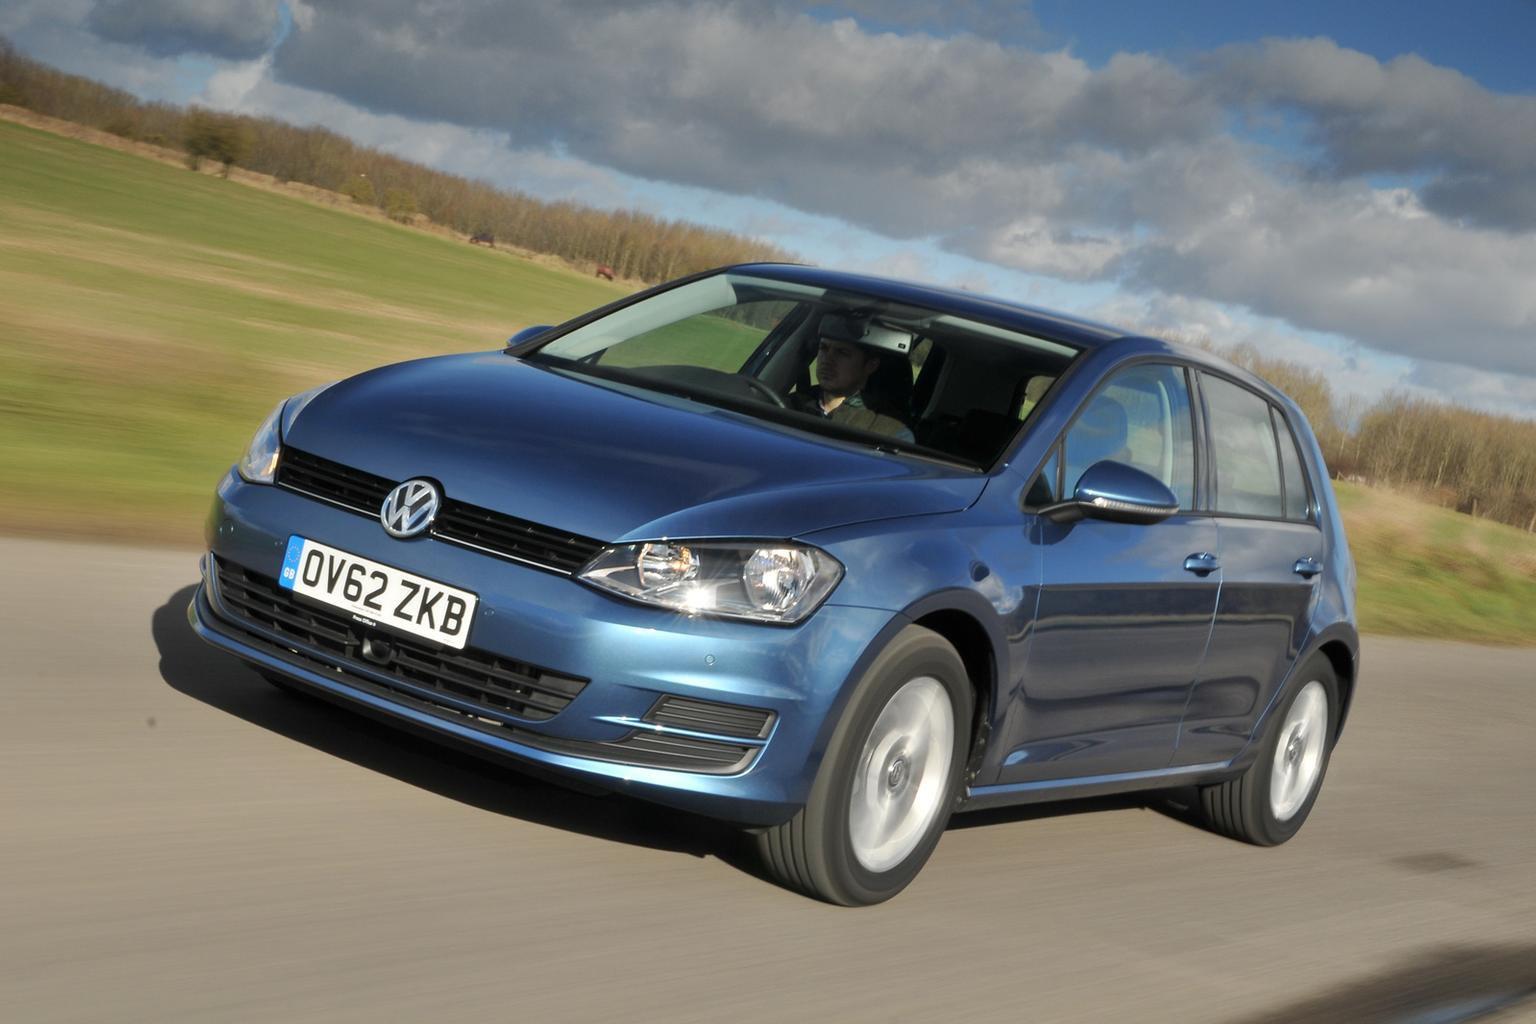 Deal of the day: Volkswagen Golf